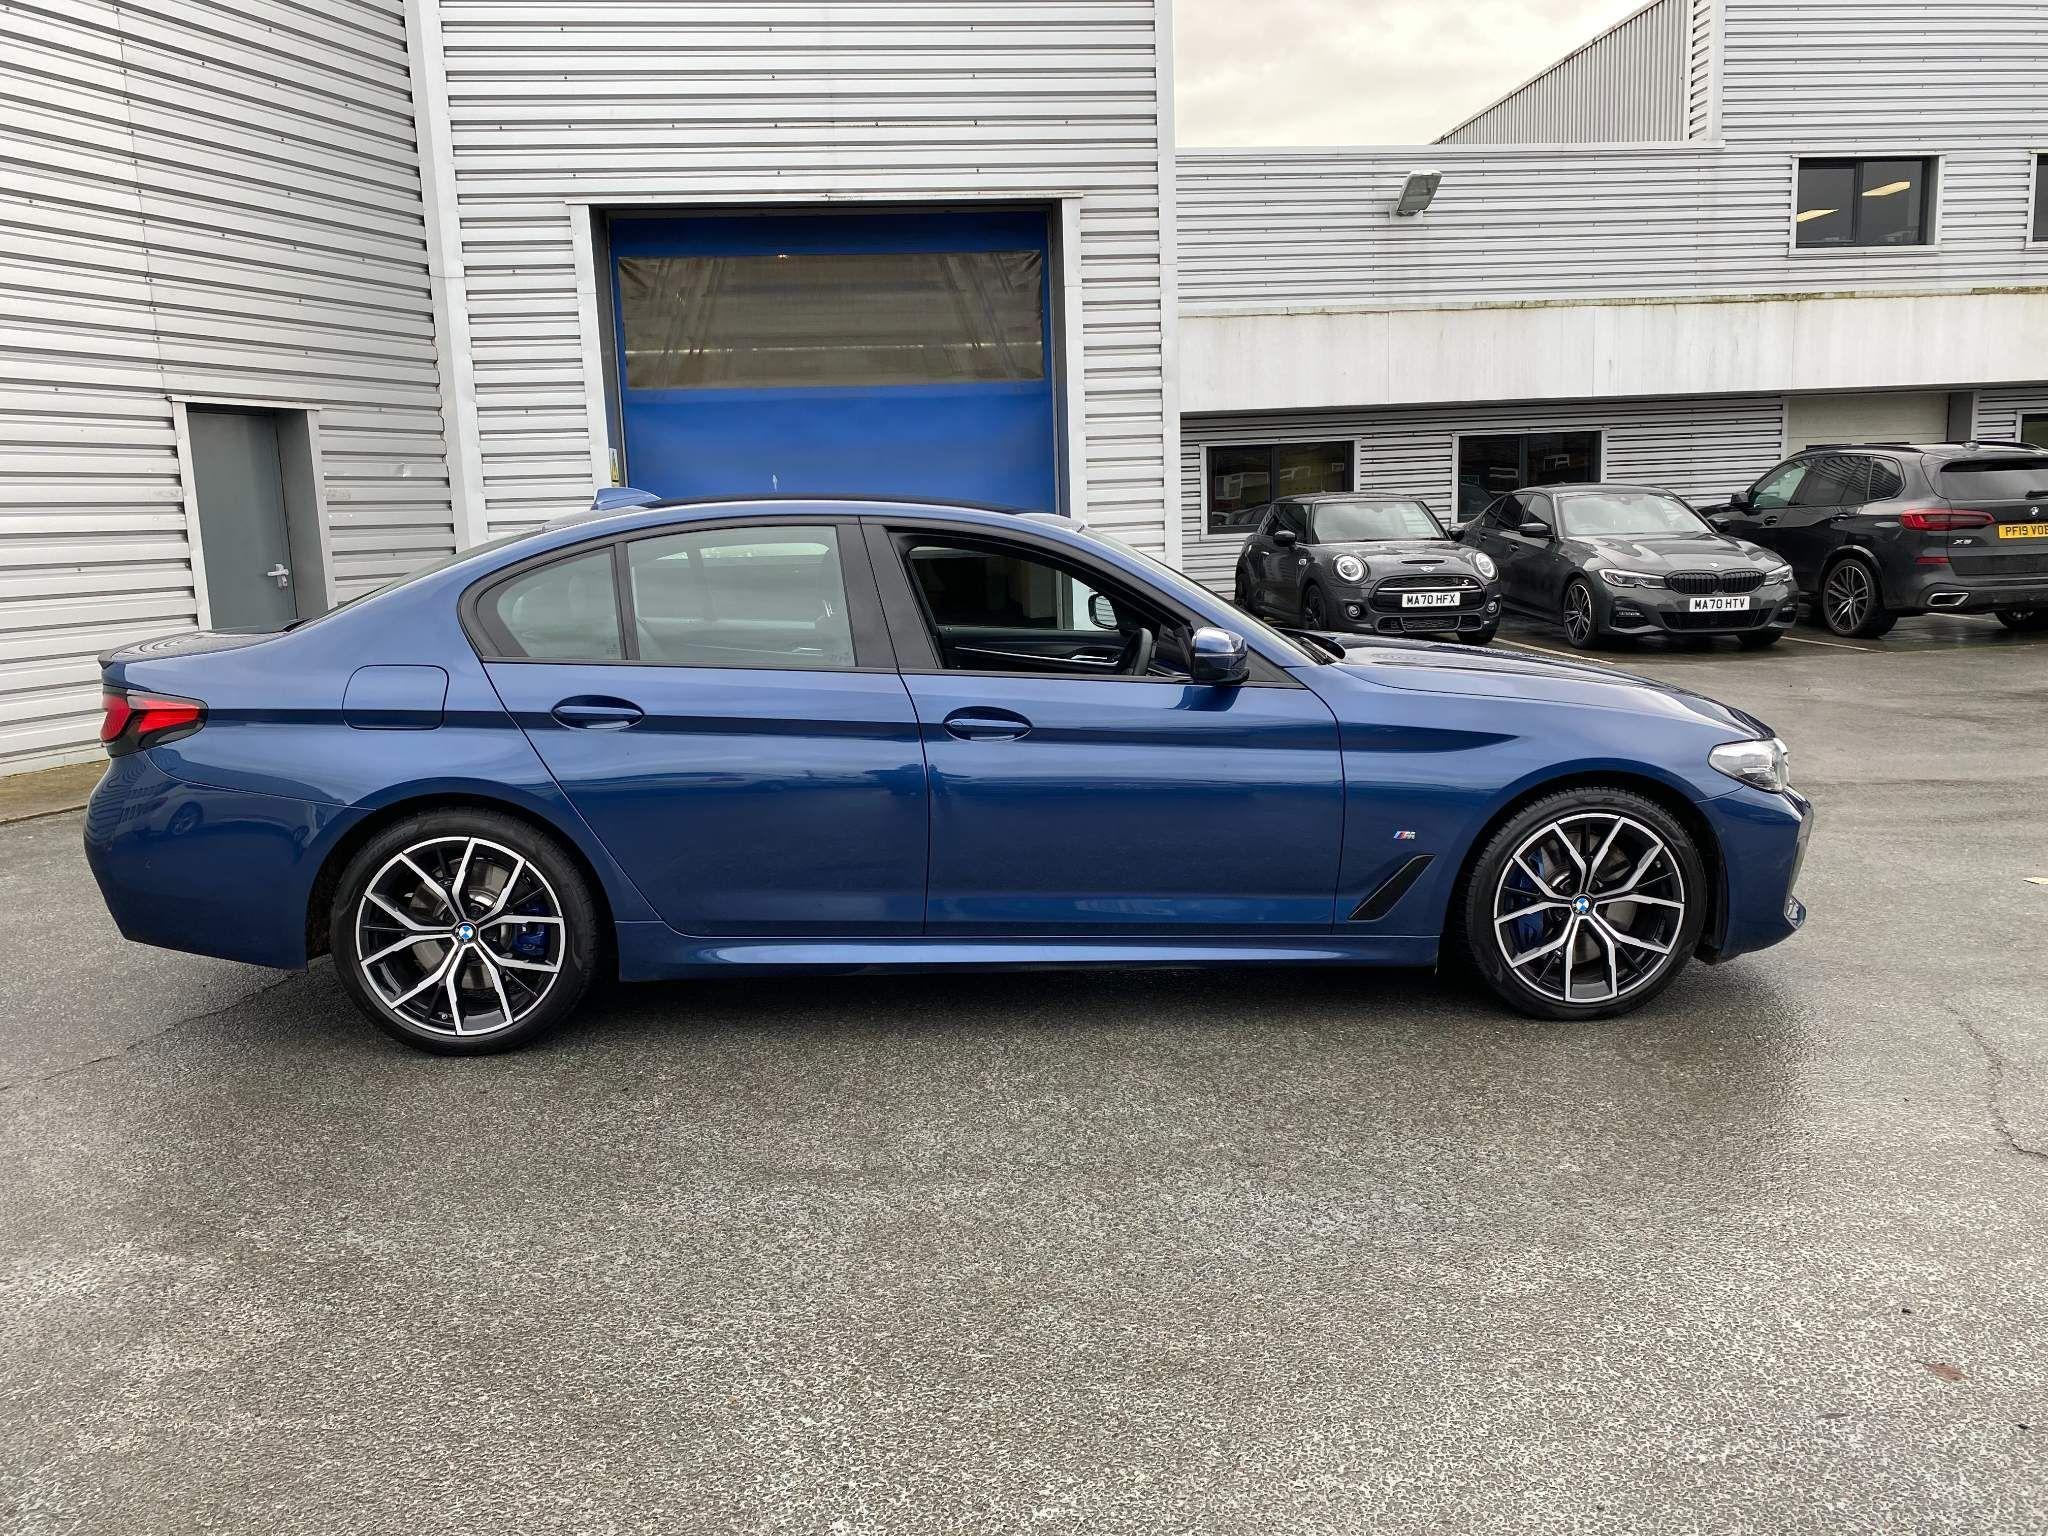 Image 3 - BMW 530d xDrive M Sport Saloon (MV70CGK)